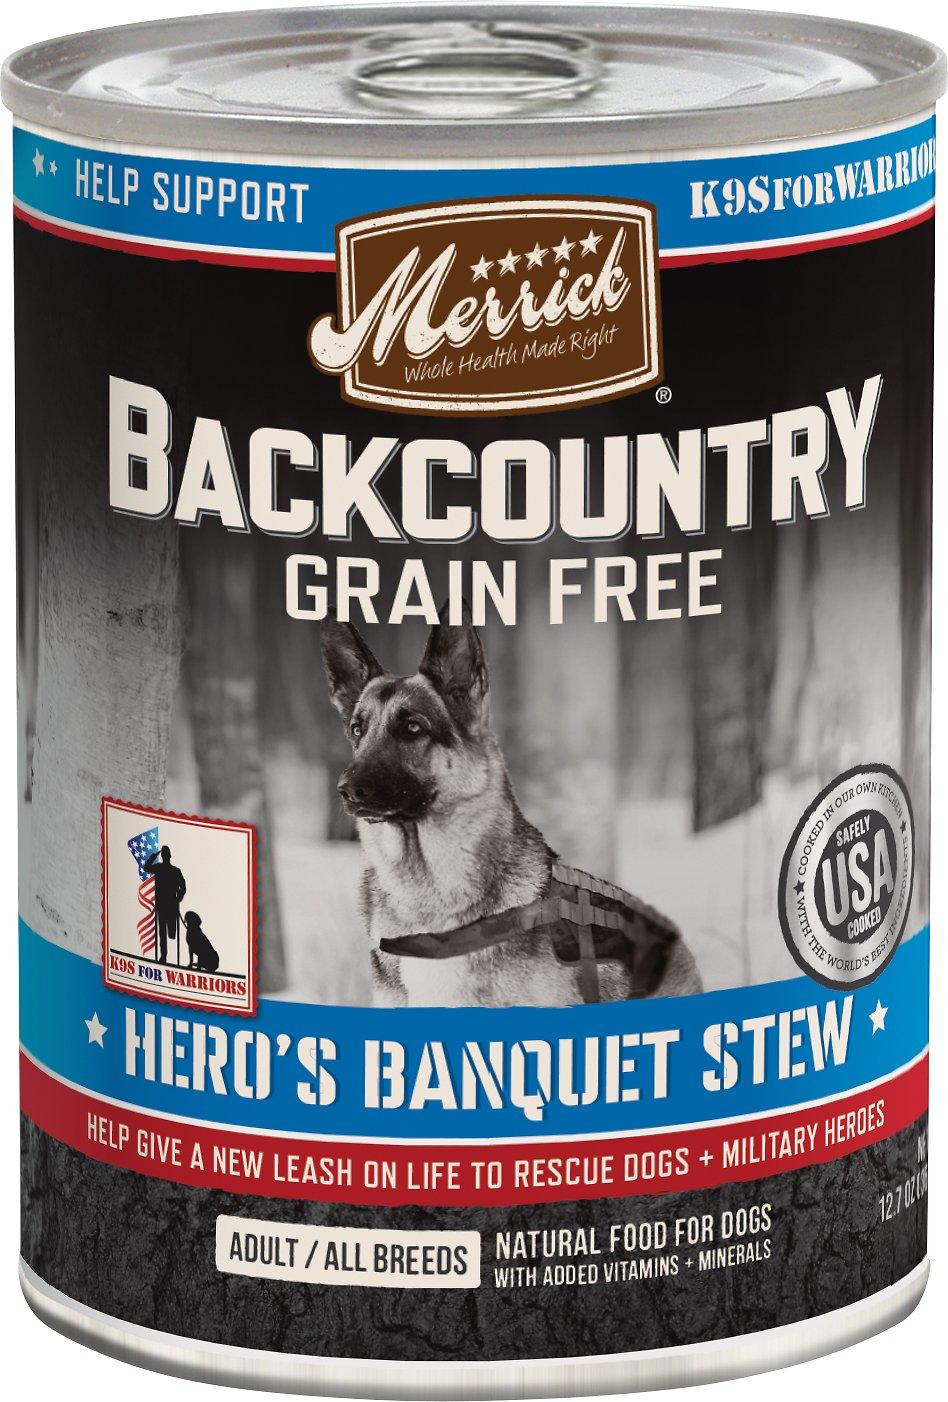 Merrick Backcountry Hero's Banquet Stew Grain-Free Canned Dog Food, 12.7-oz